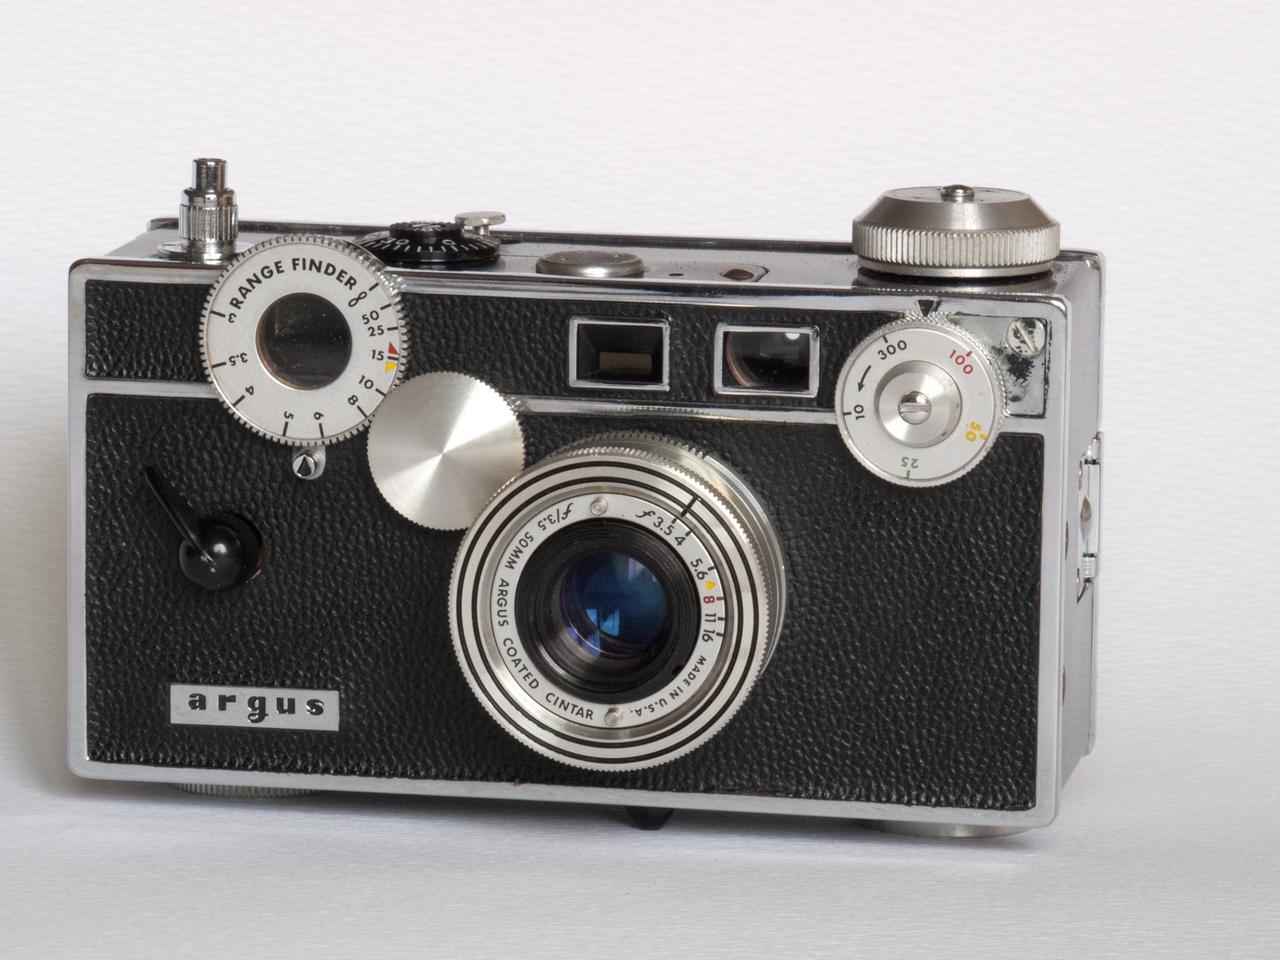 collectiblend cameras collection by enderxen. Black Bedroom Furniture Sets. Home Design Ideas